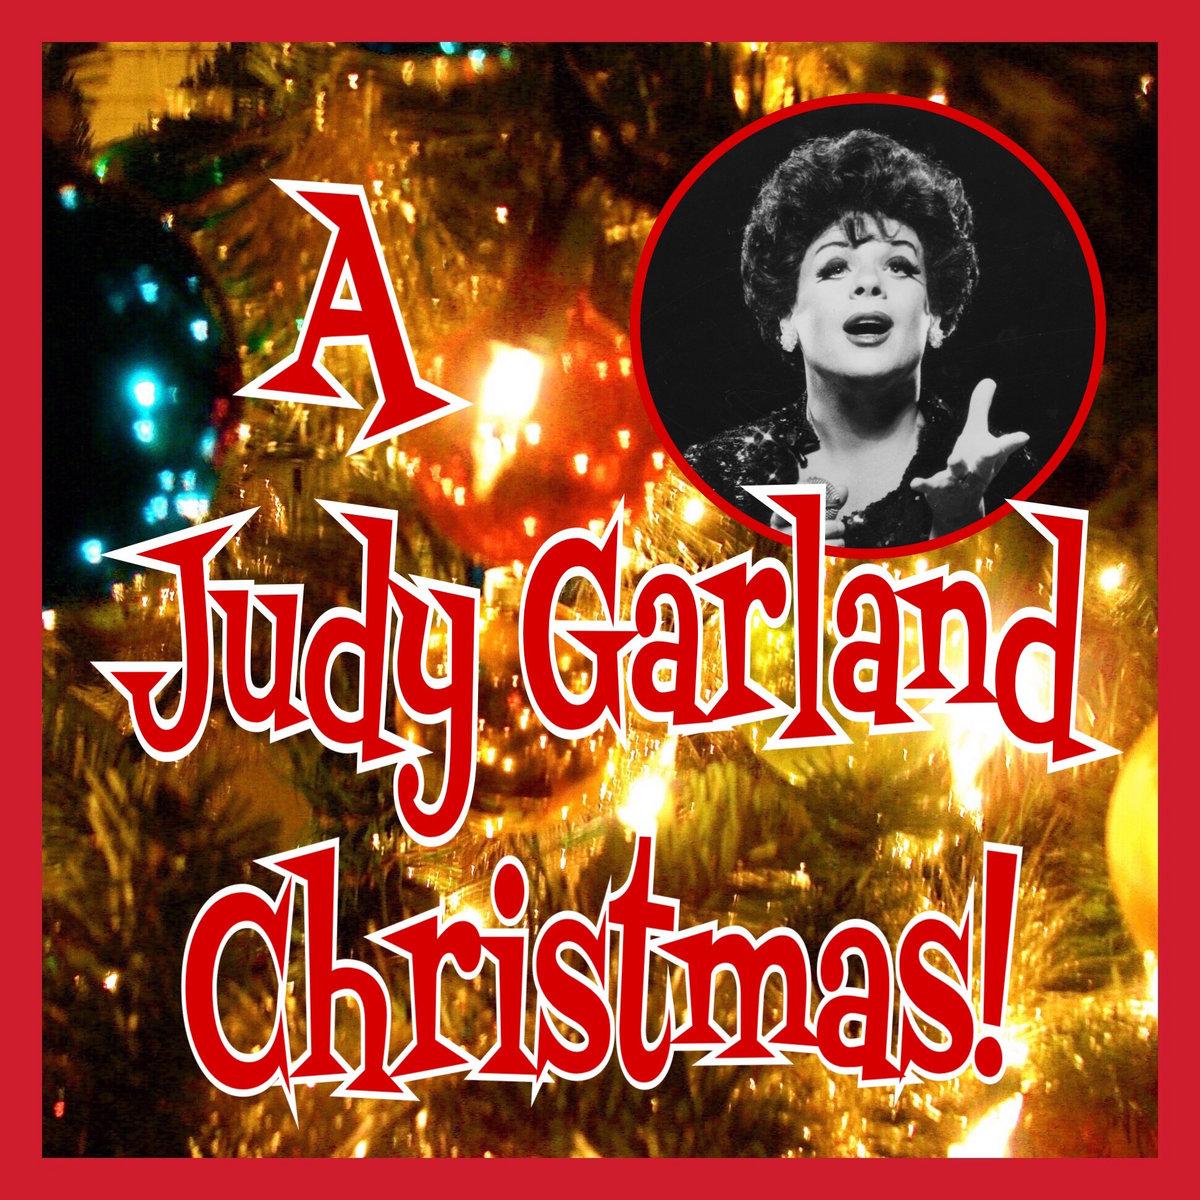 A Judy Garland Christmas | Michael Ogborn